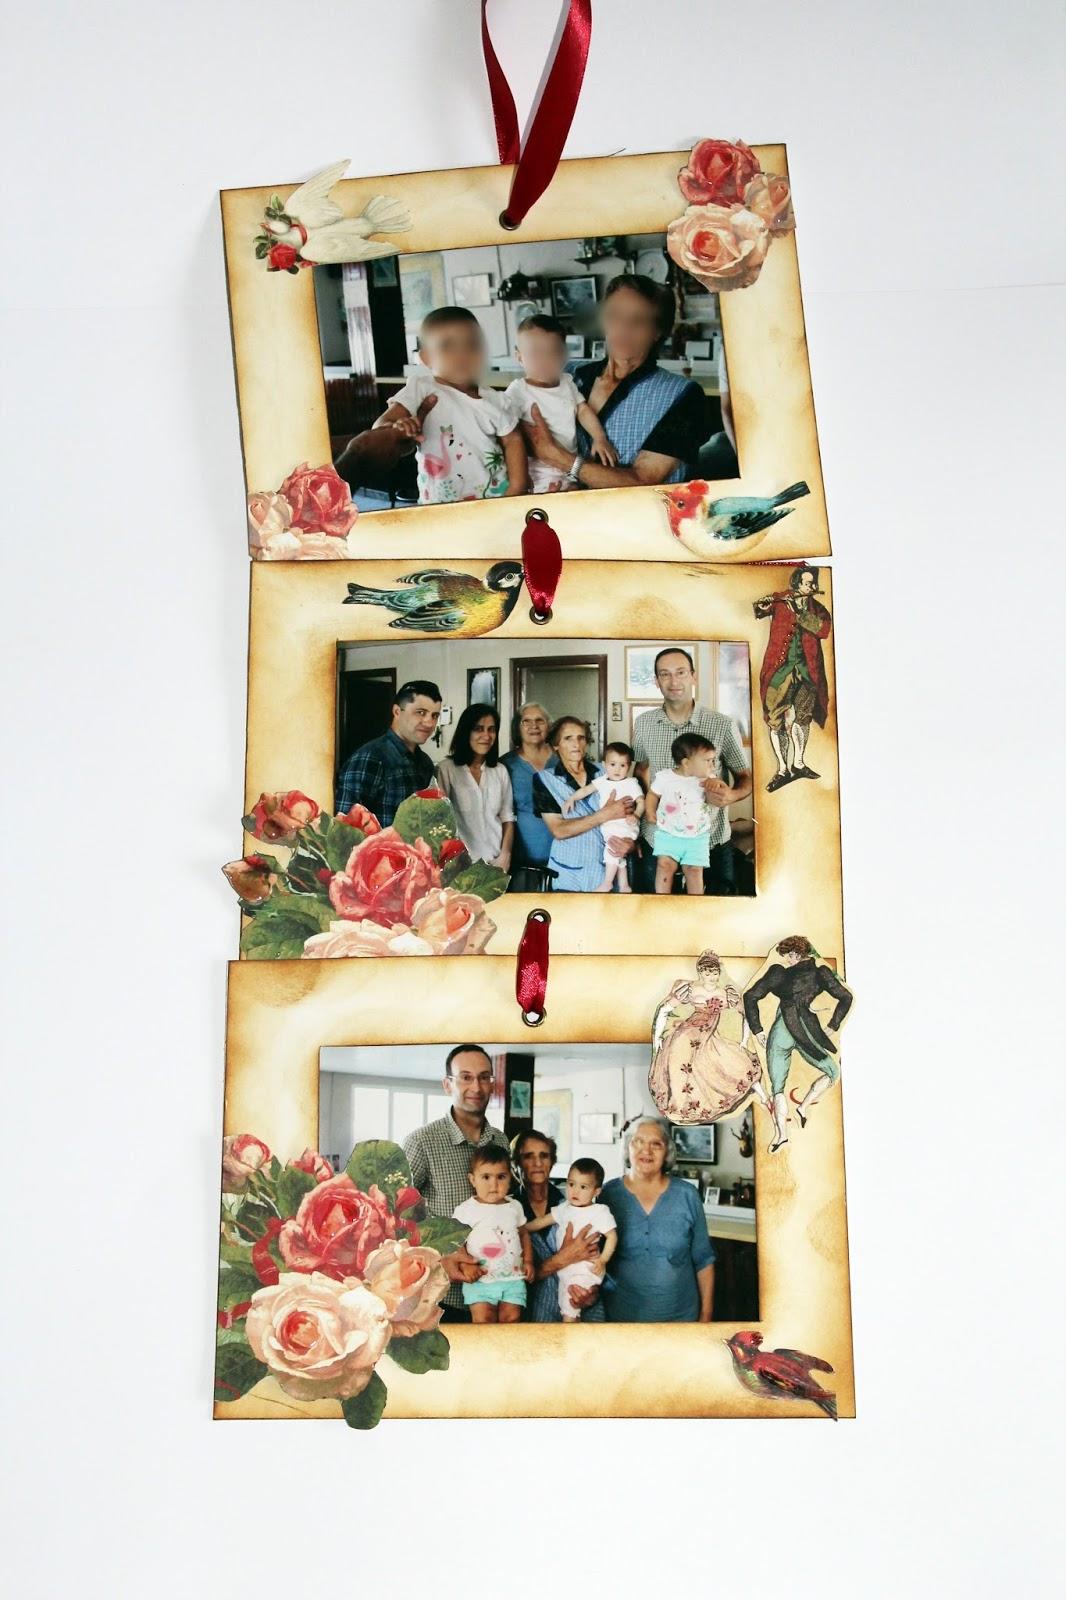 Magdalena de papel: Marco de fotos para un regalo